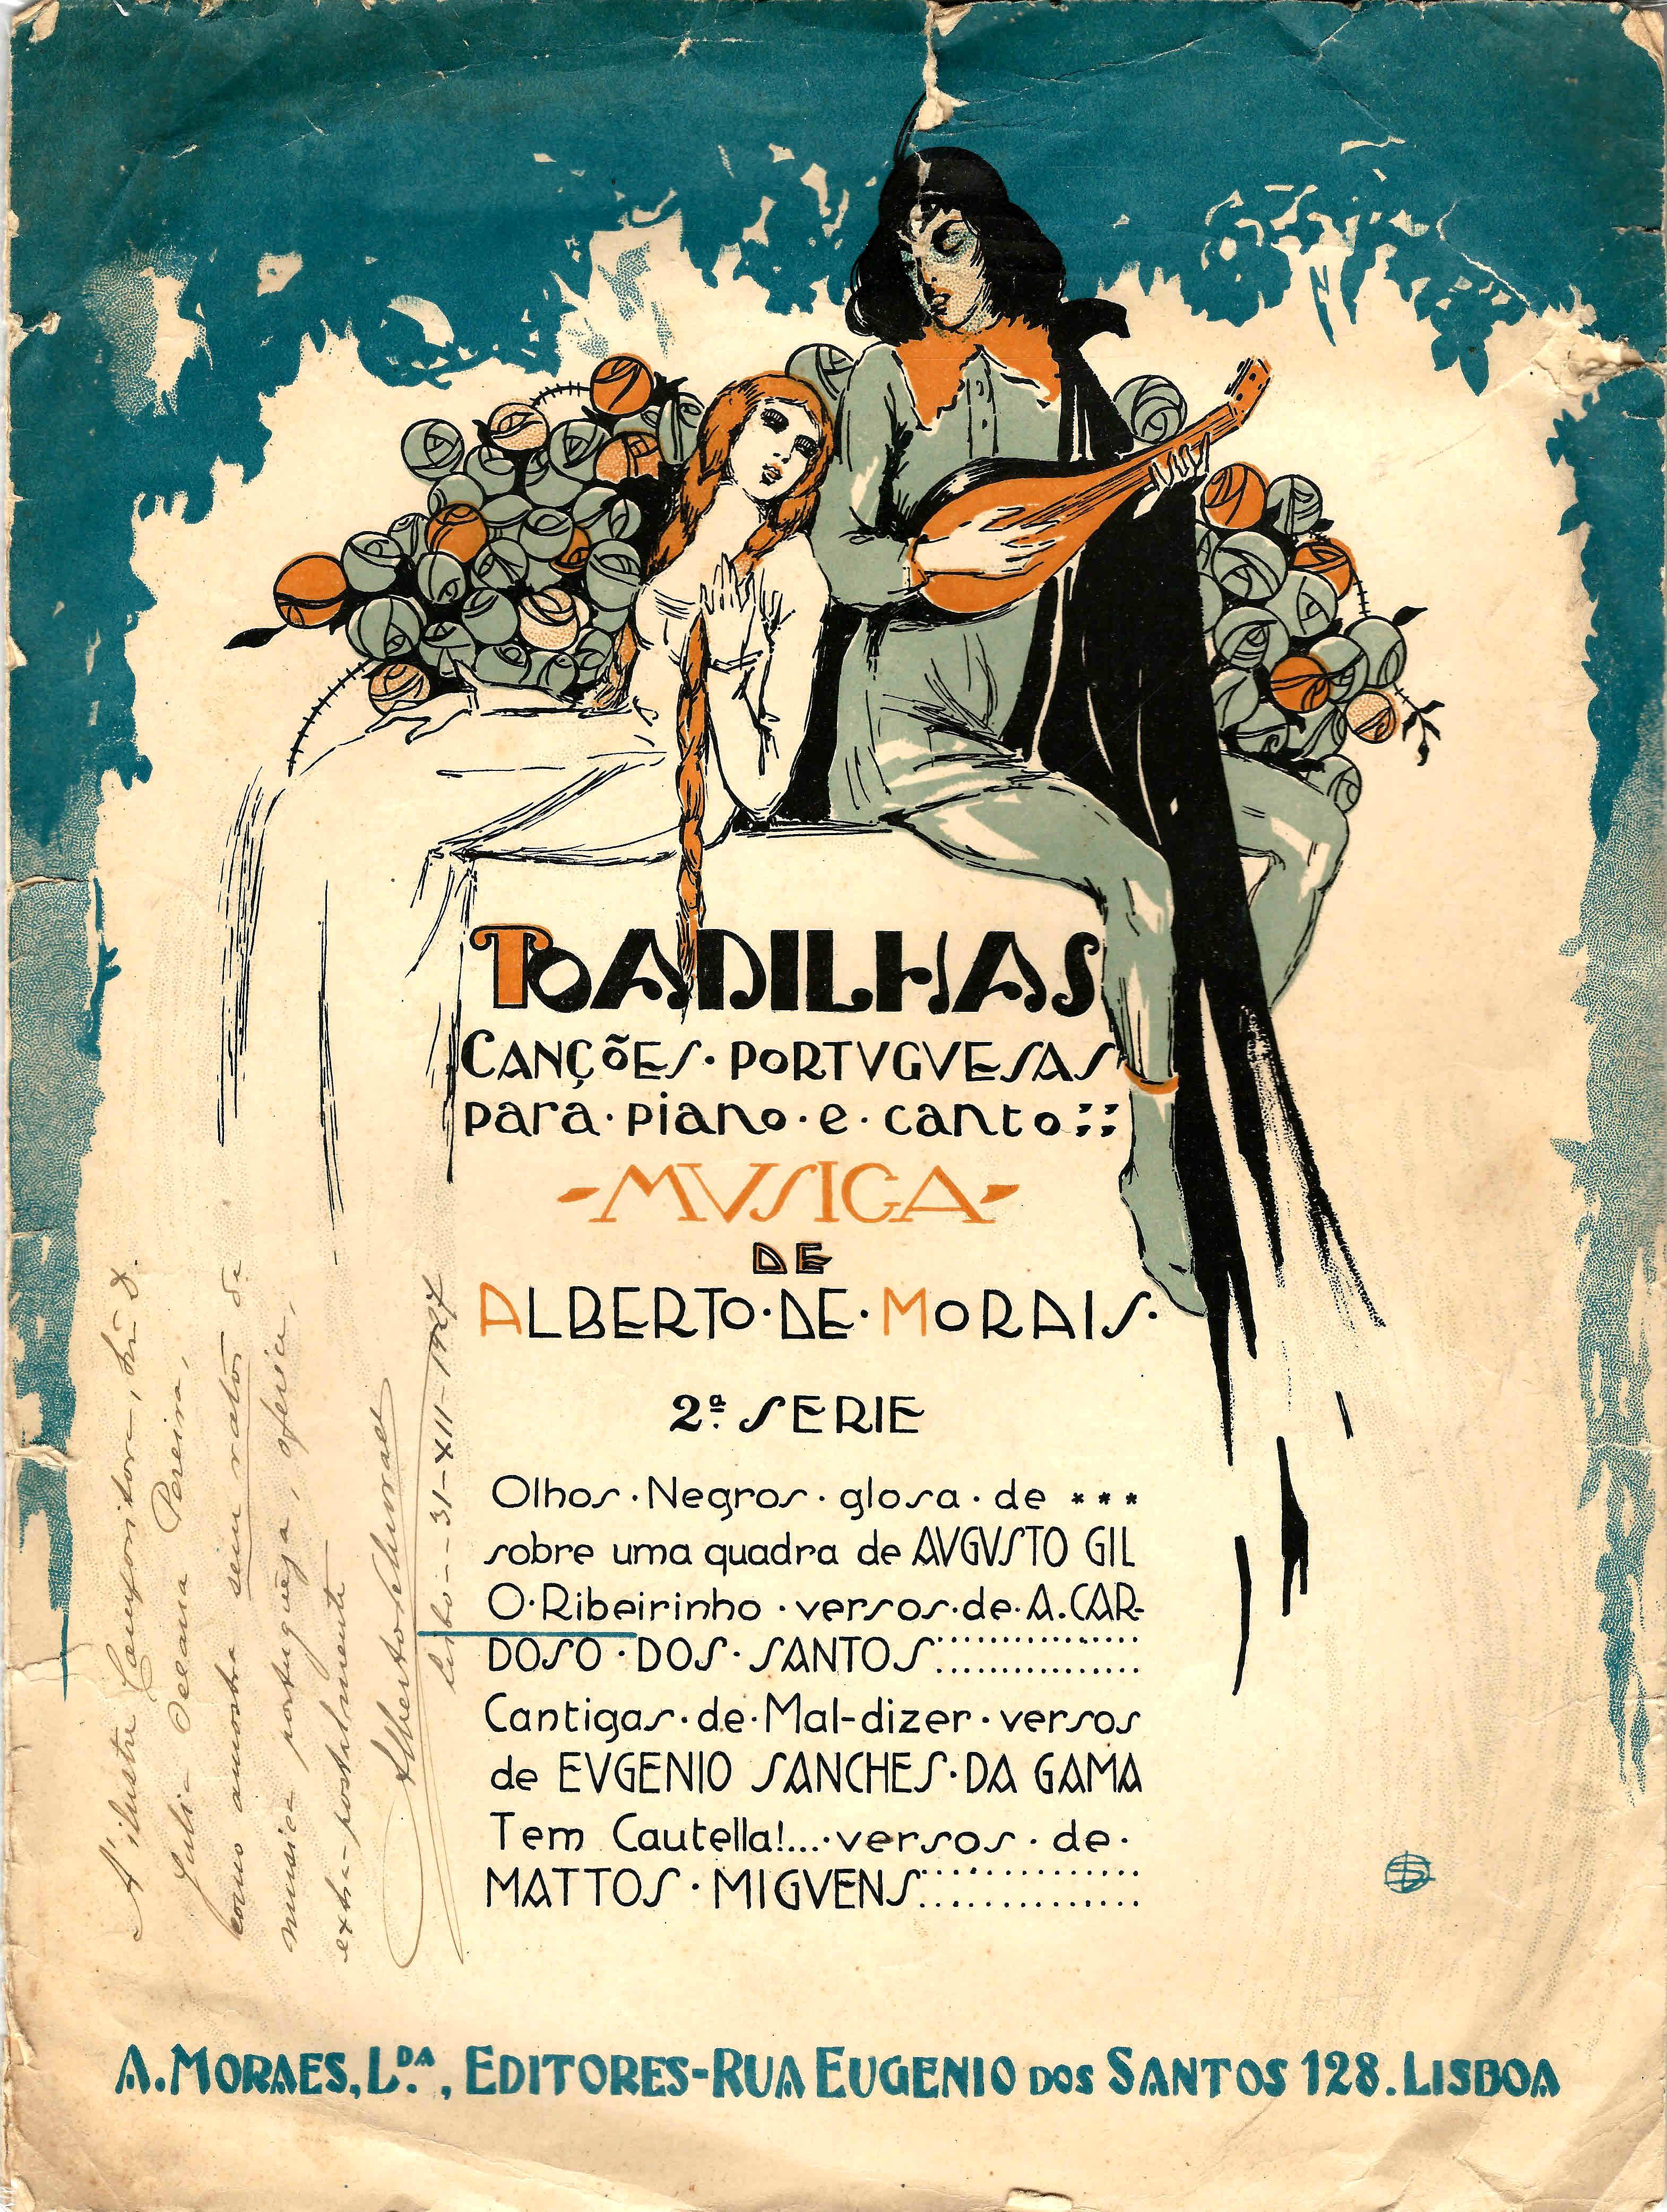 Arquivo partituras ephemera biblioteca e arquivo de jos arquivo partituras fandeluxe Gallery